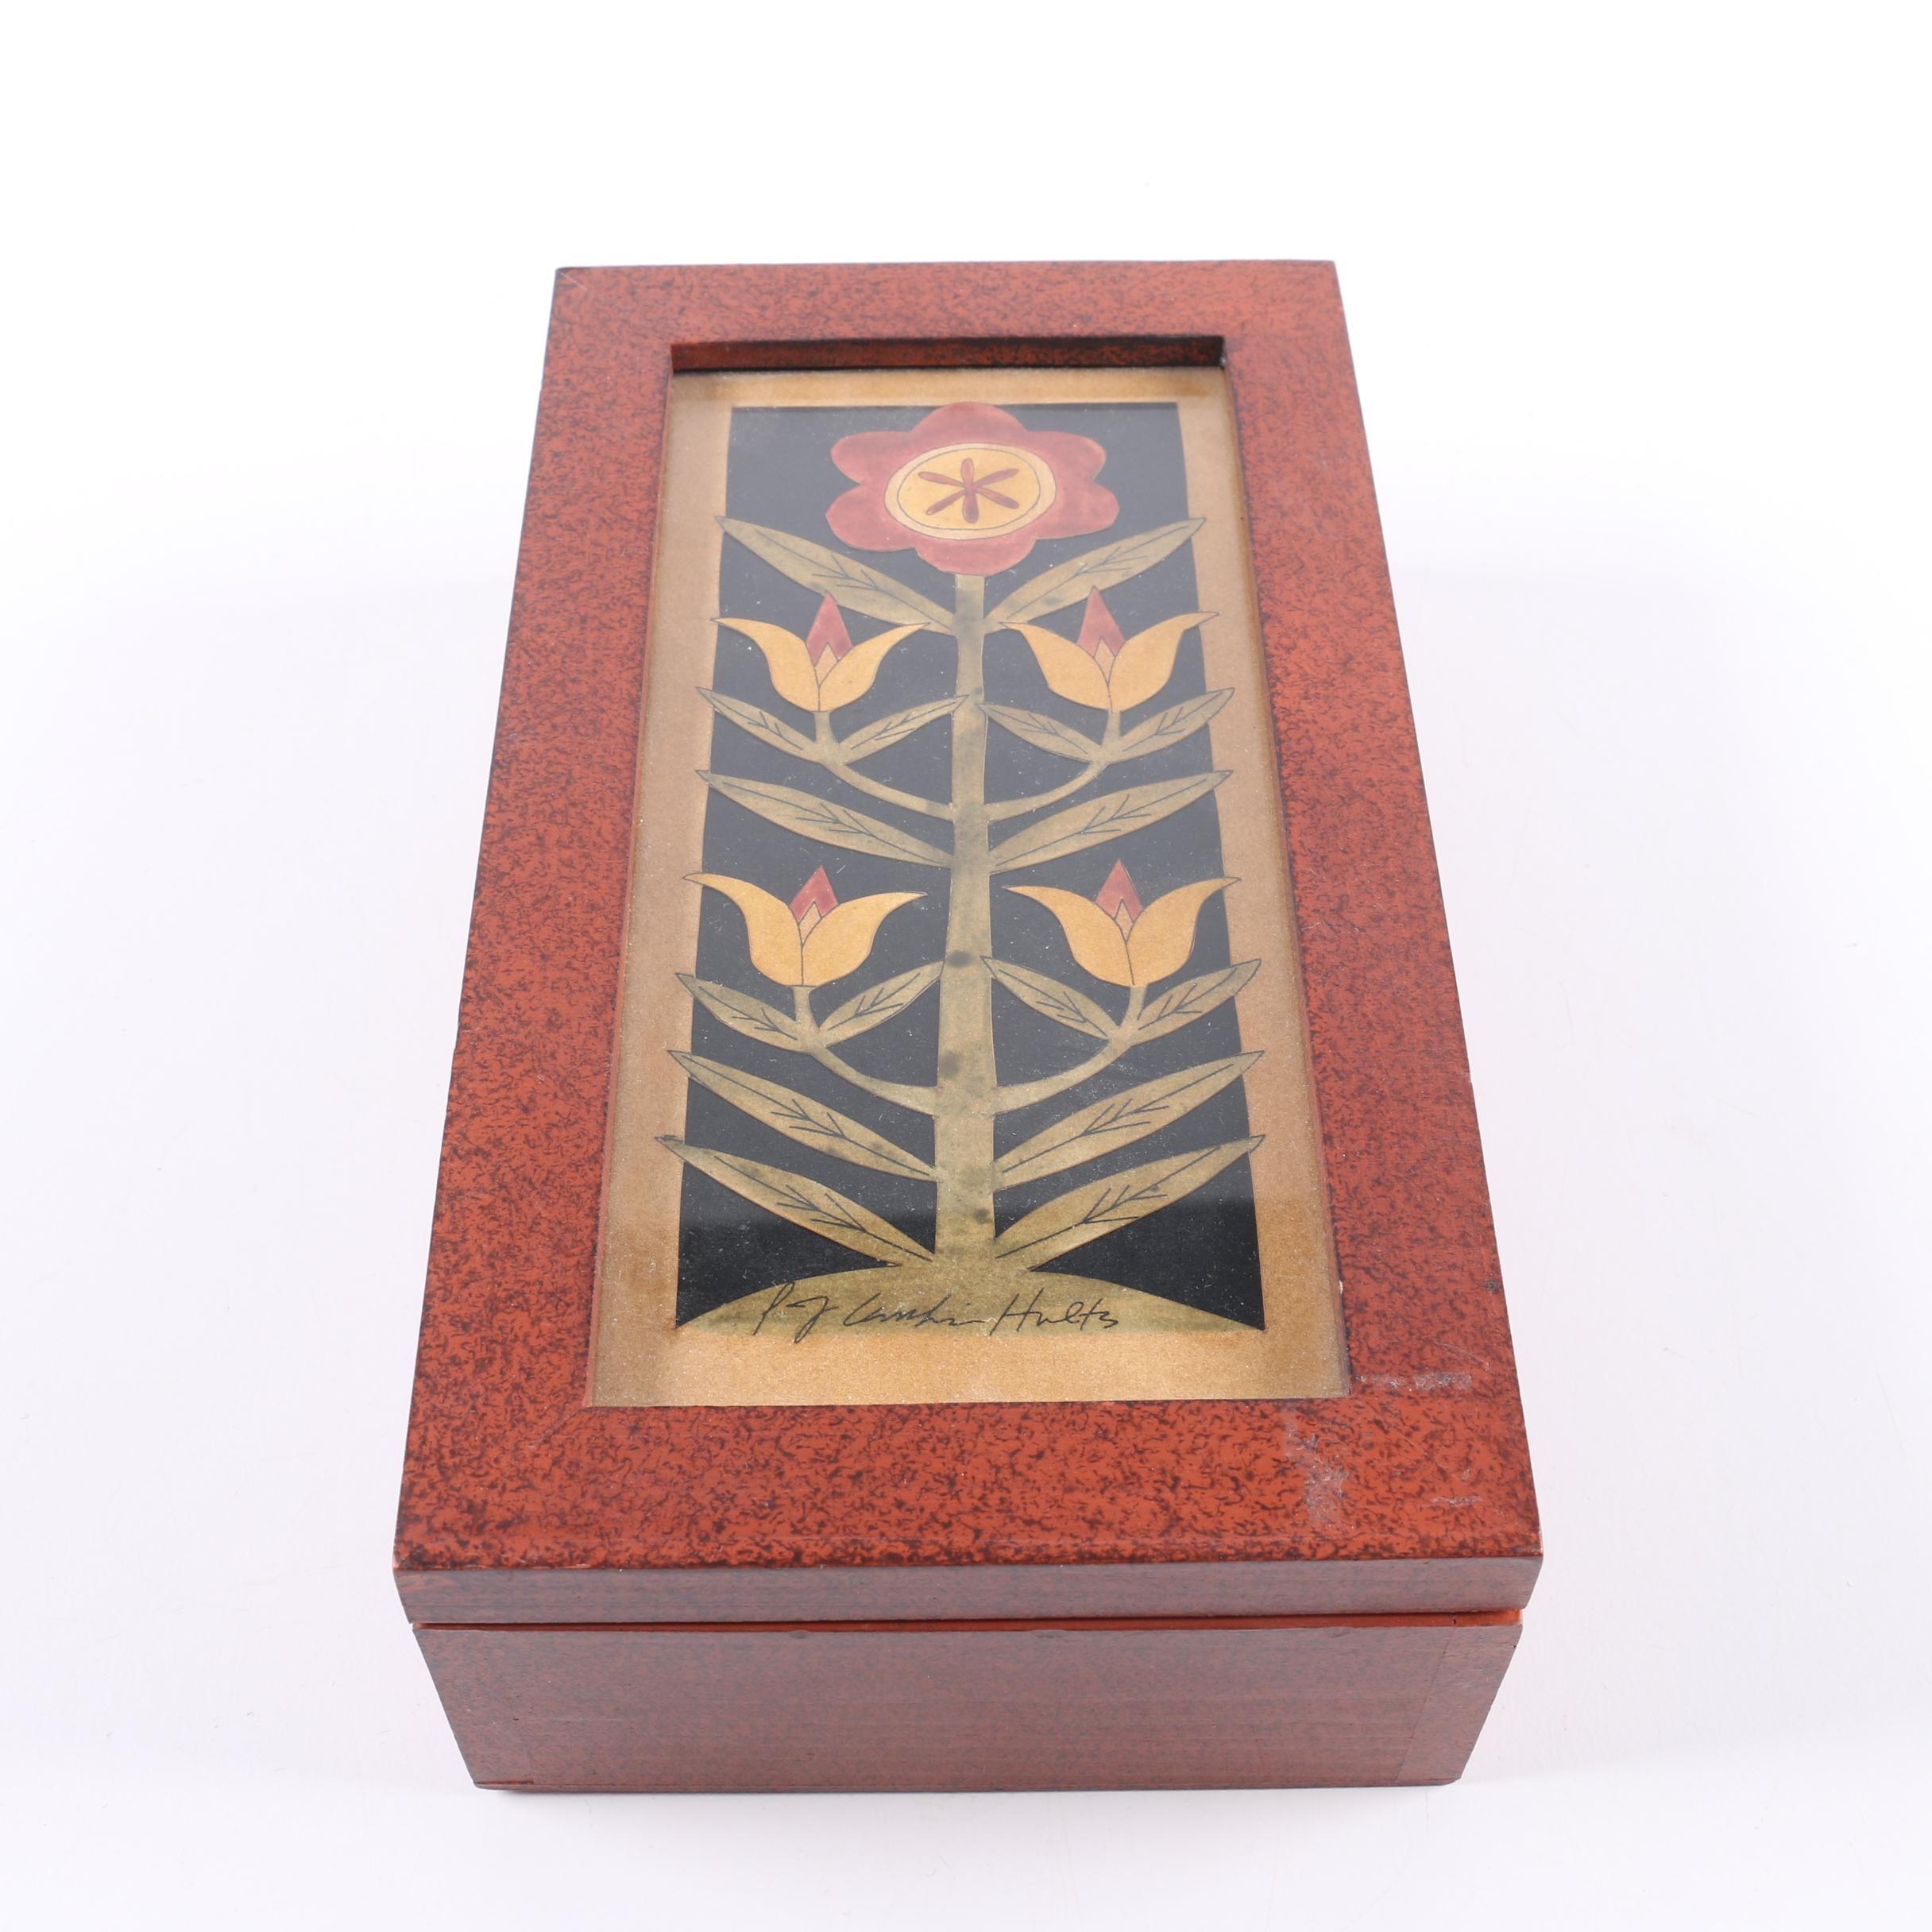 Hinged Wood and Glass Box